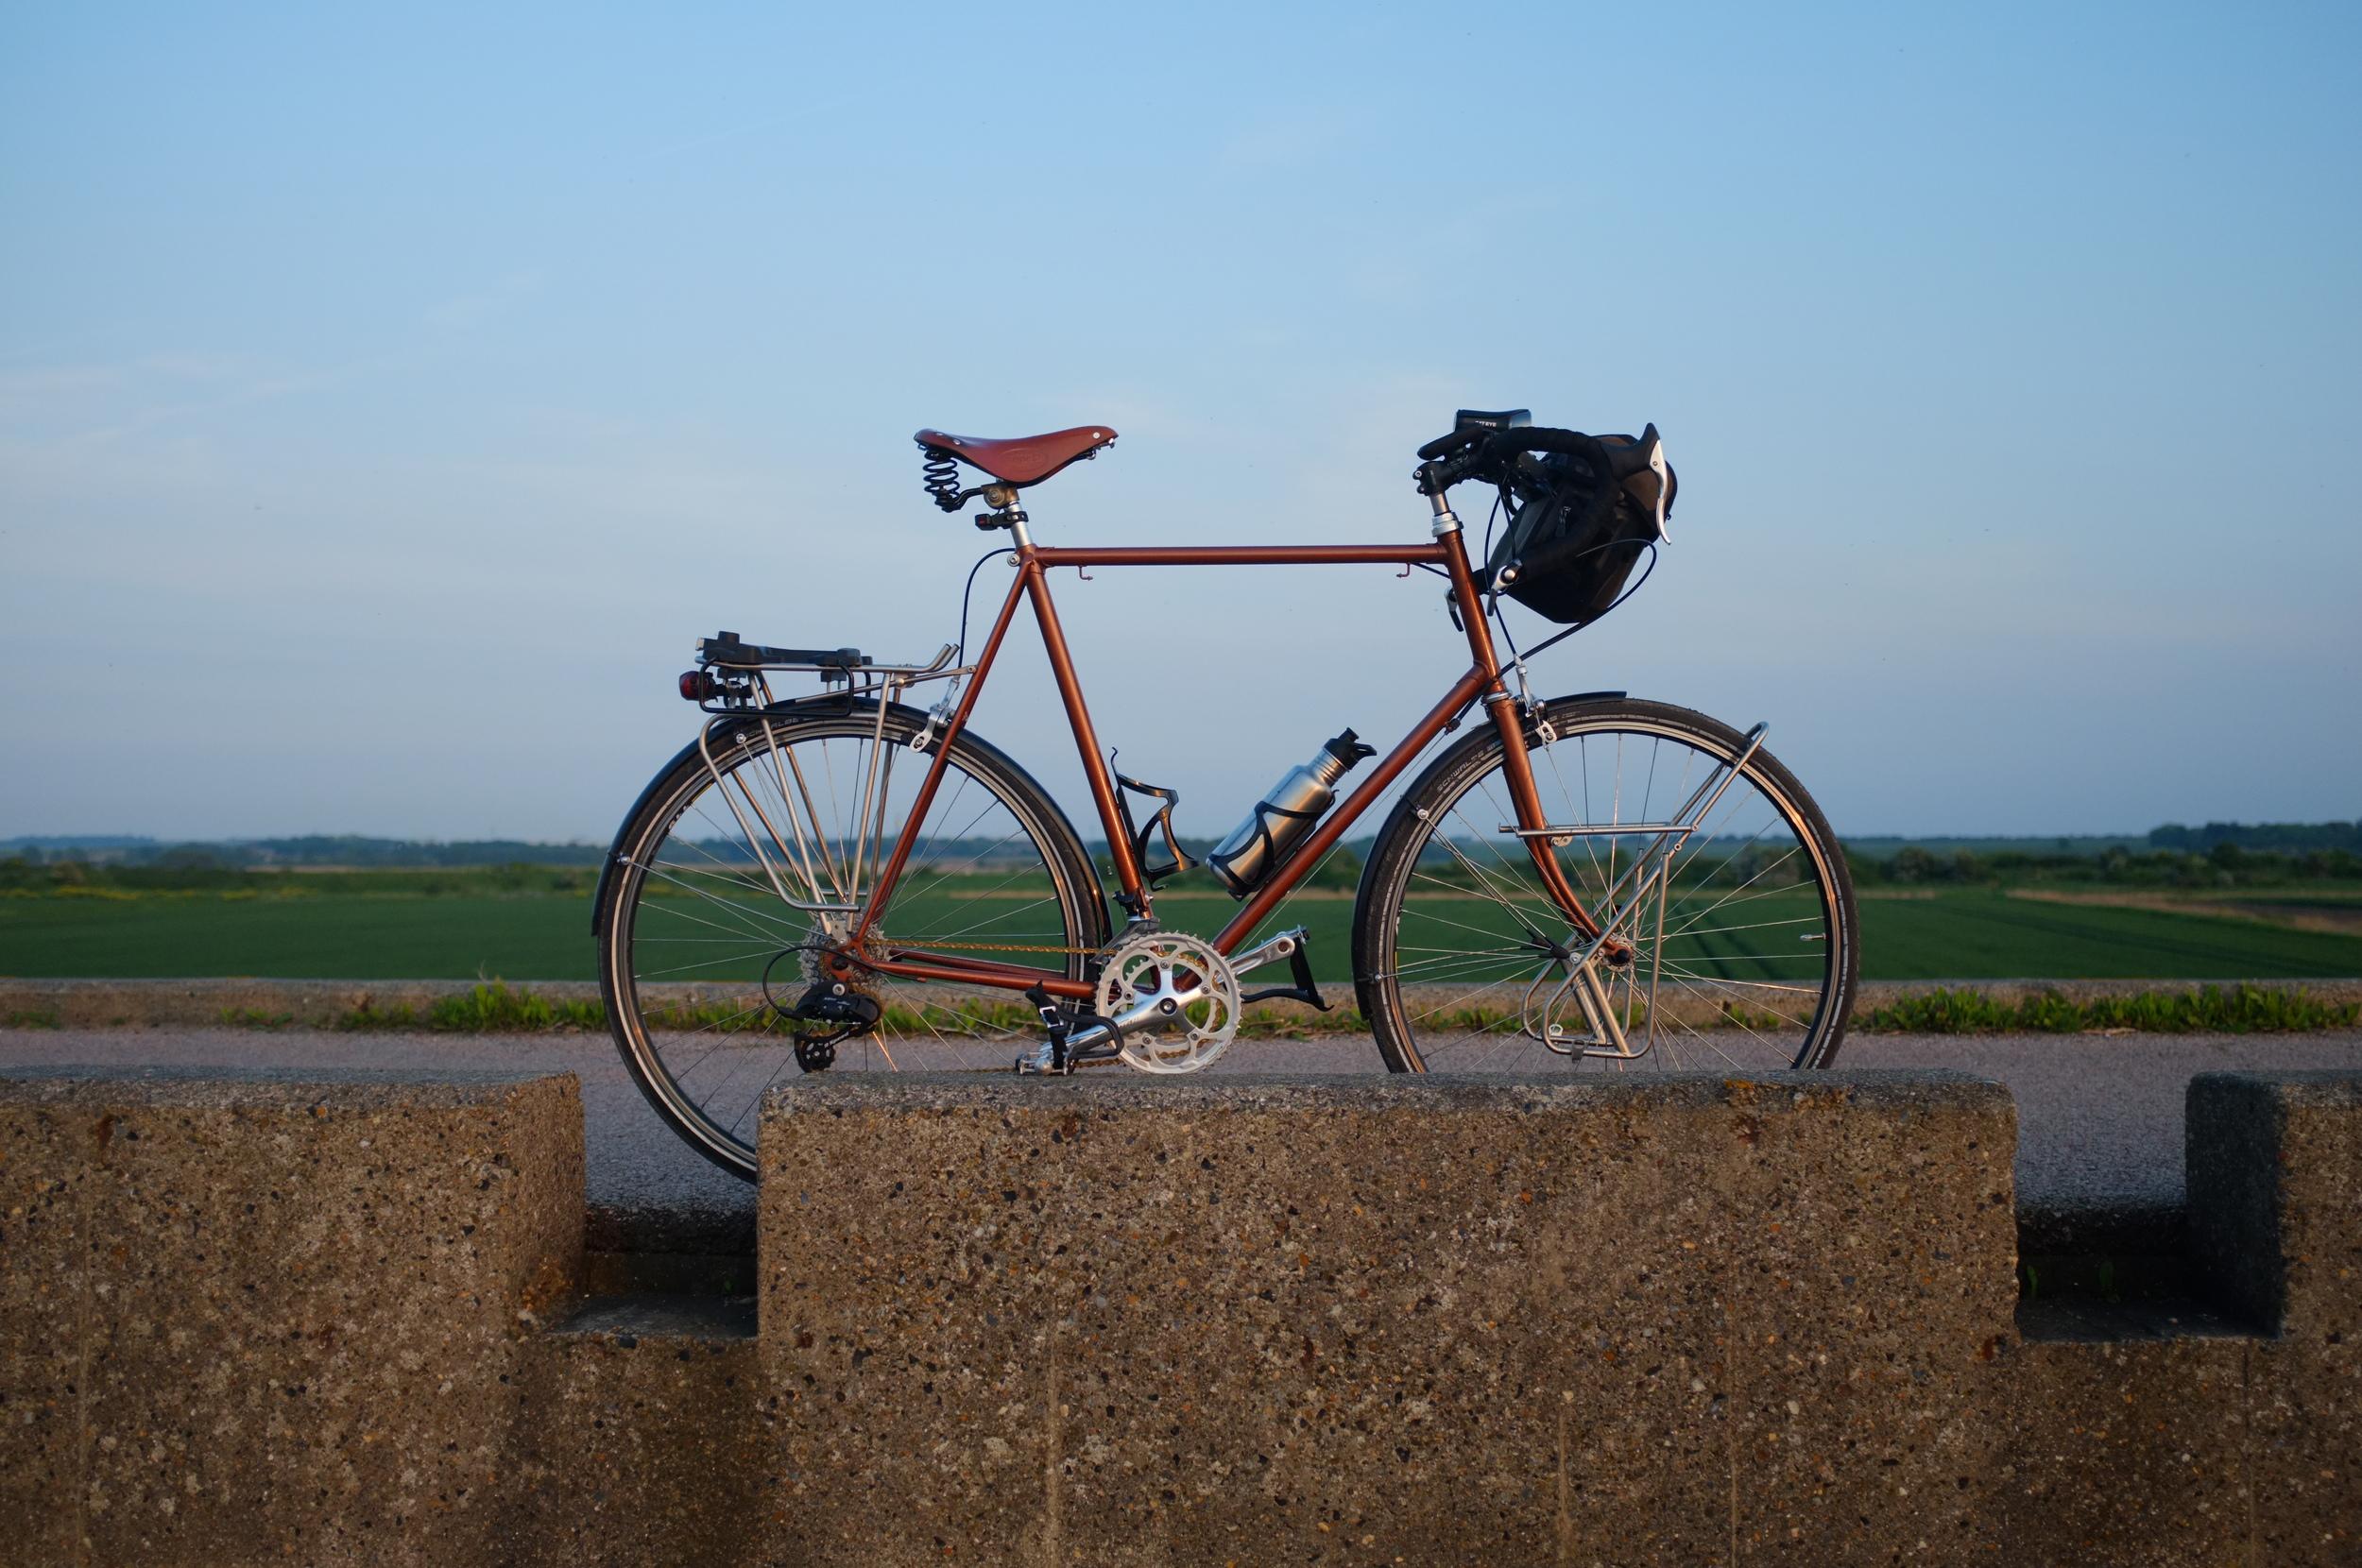 raleigh, custom touring bike, touring bike, bicycle touring apocalypse, brooks, brooks saddle, brooks flyer, brooks b17, cycle gear, review, blog,